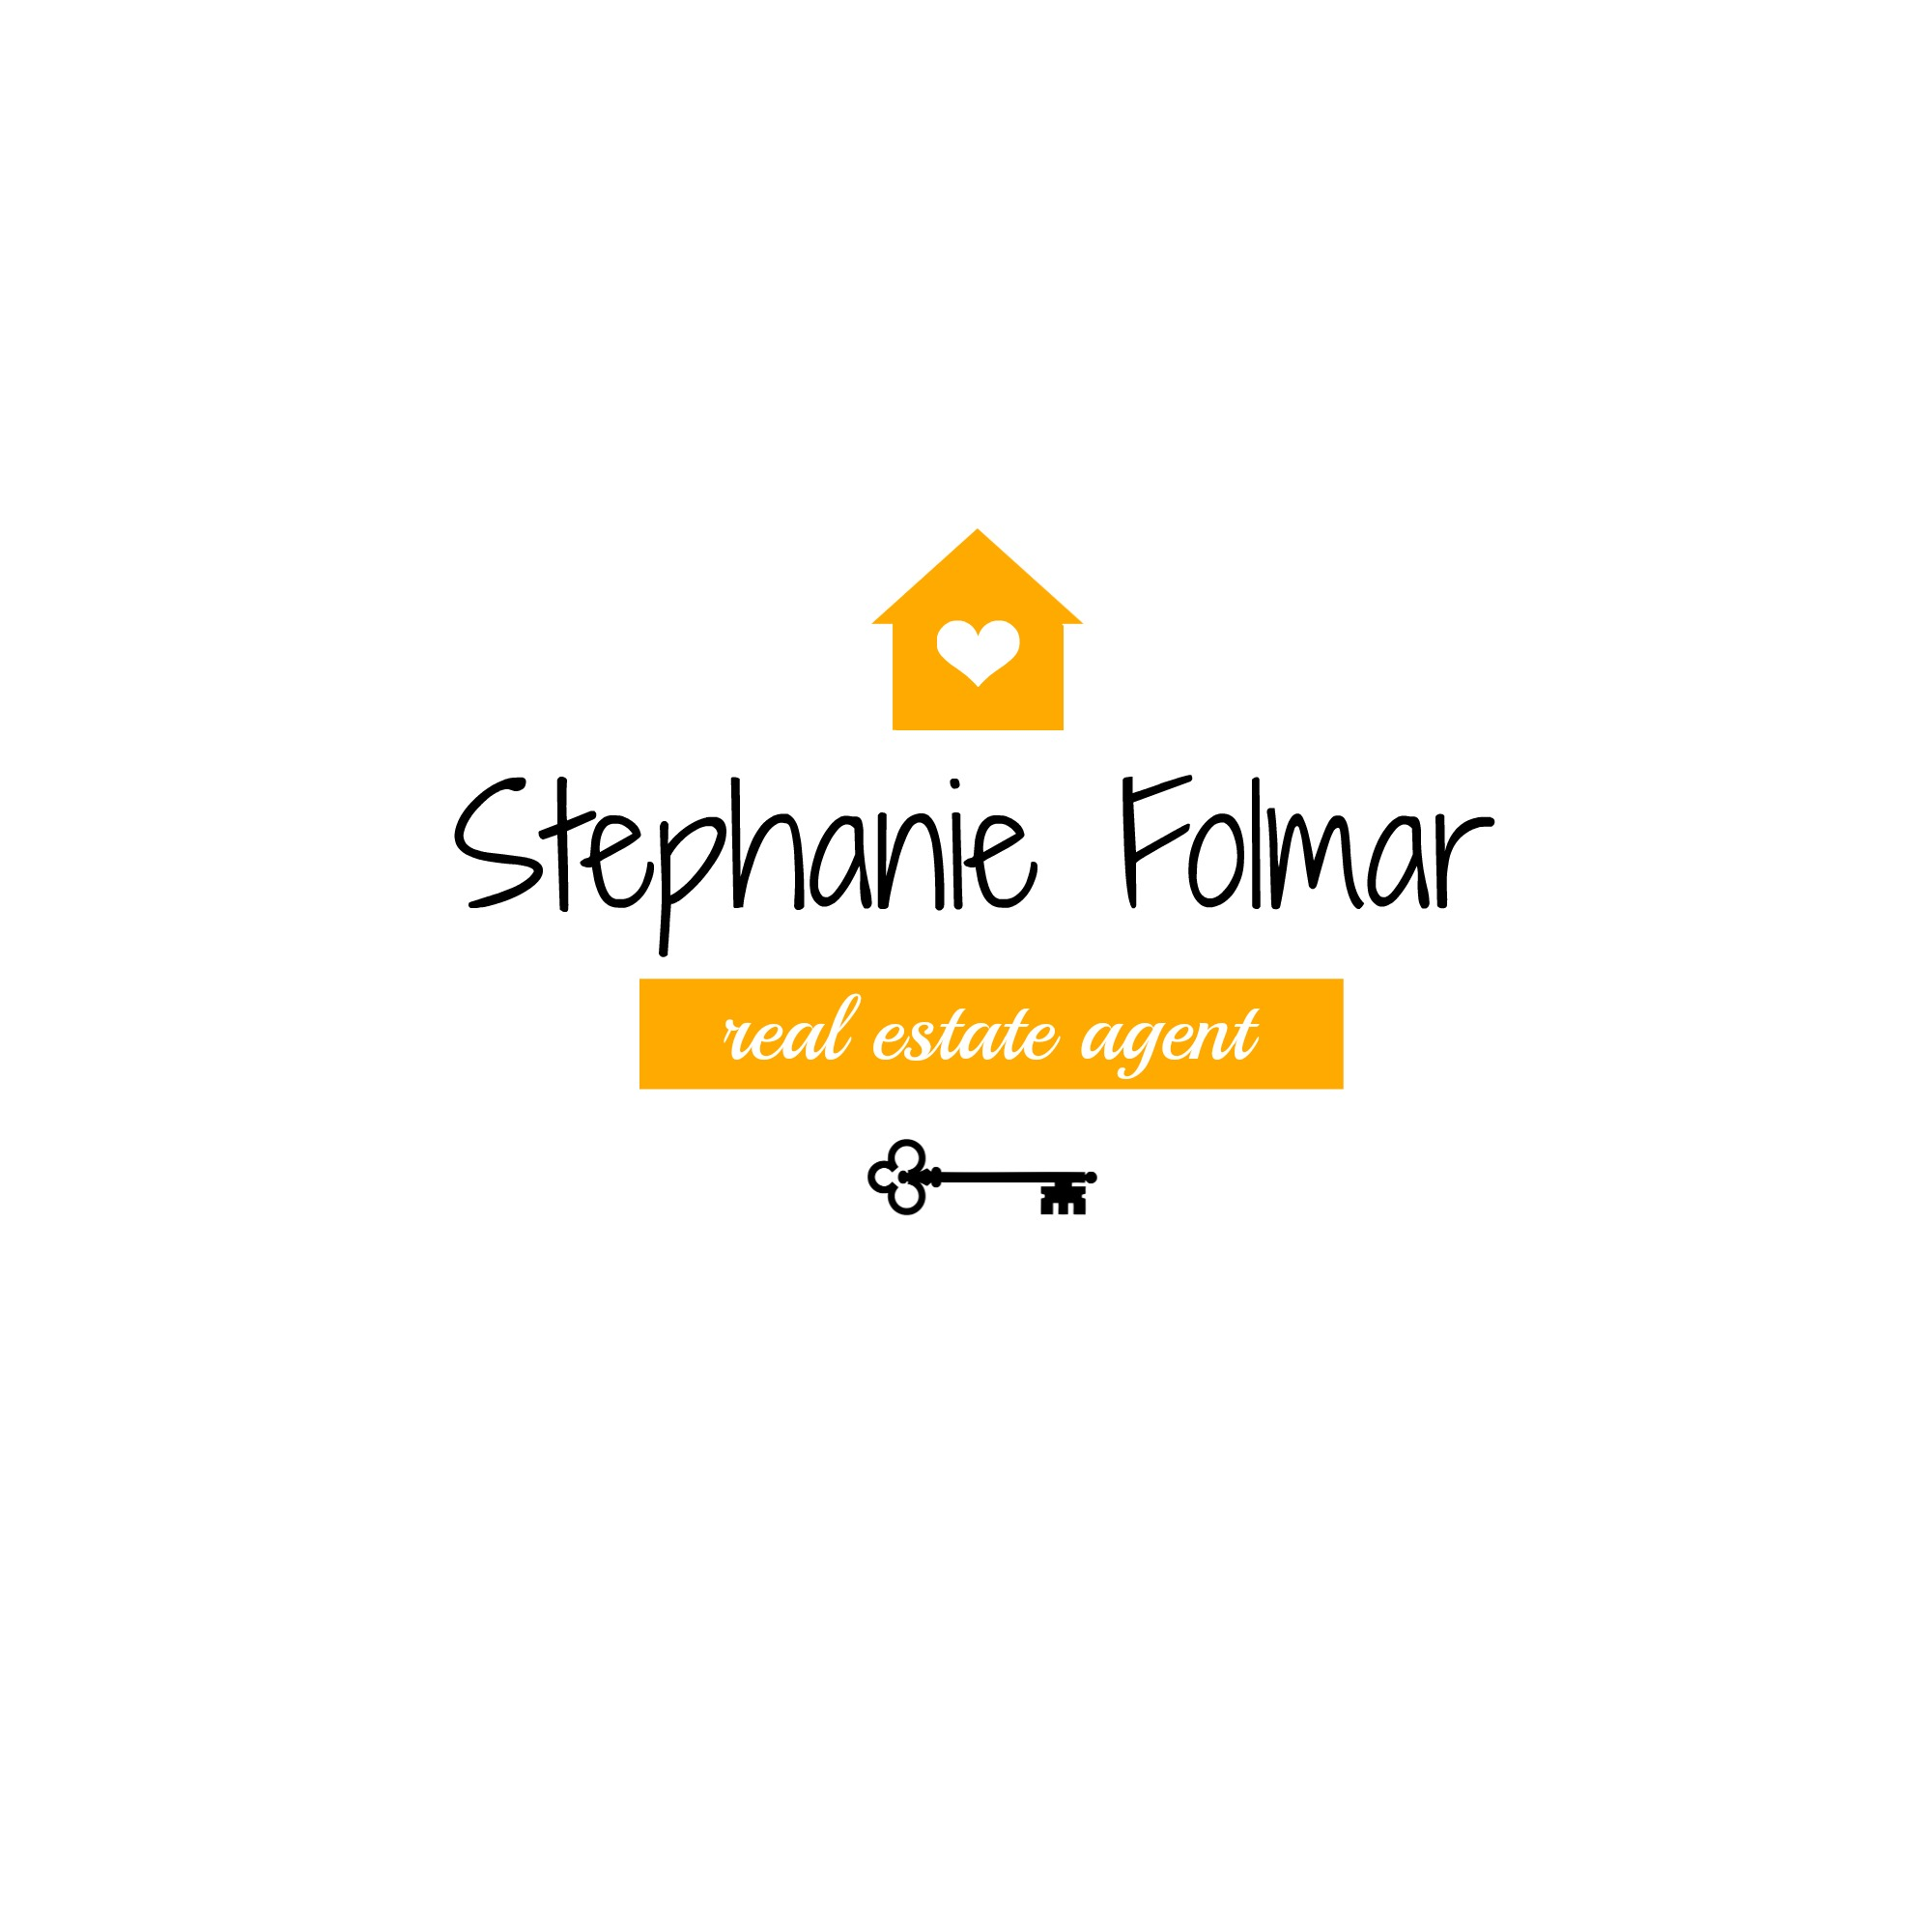 Stephanie Folmer JPG.jpg